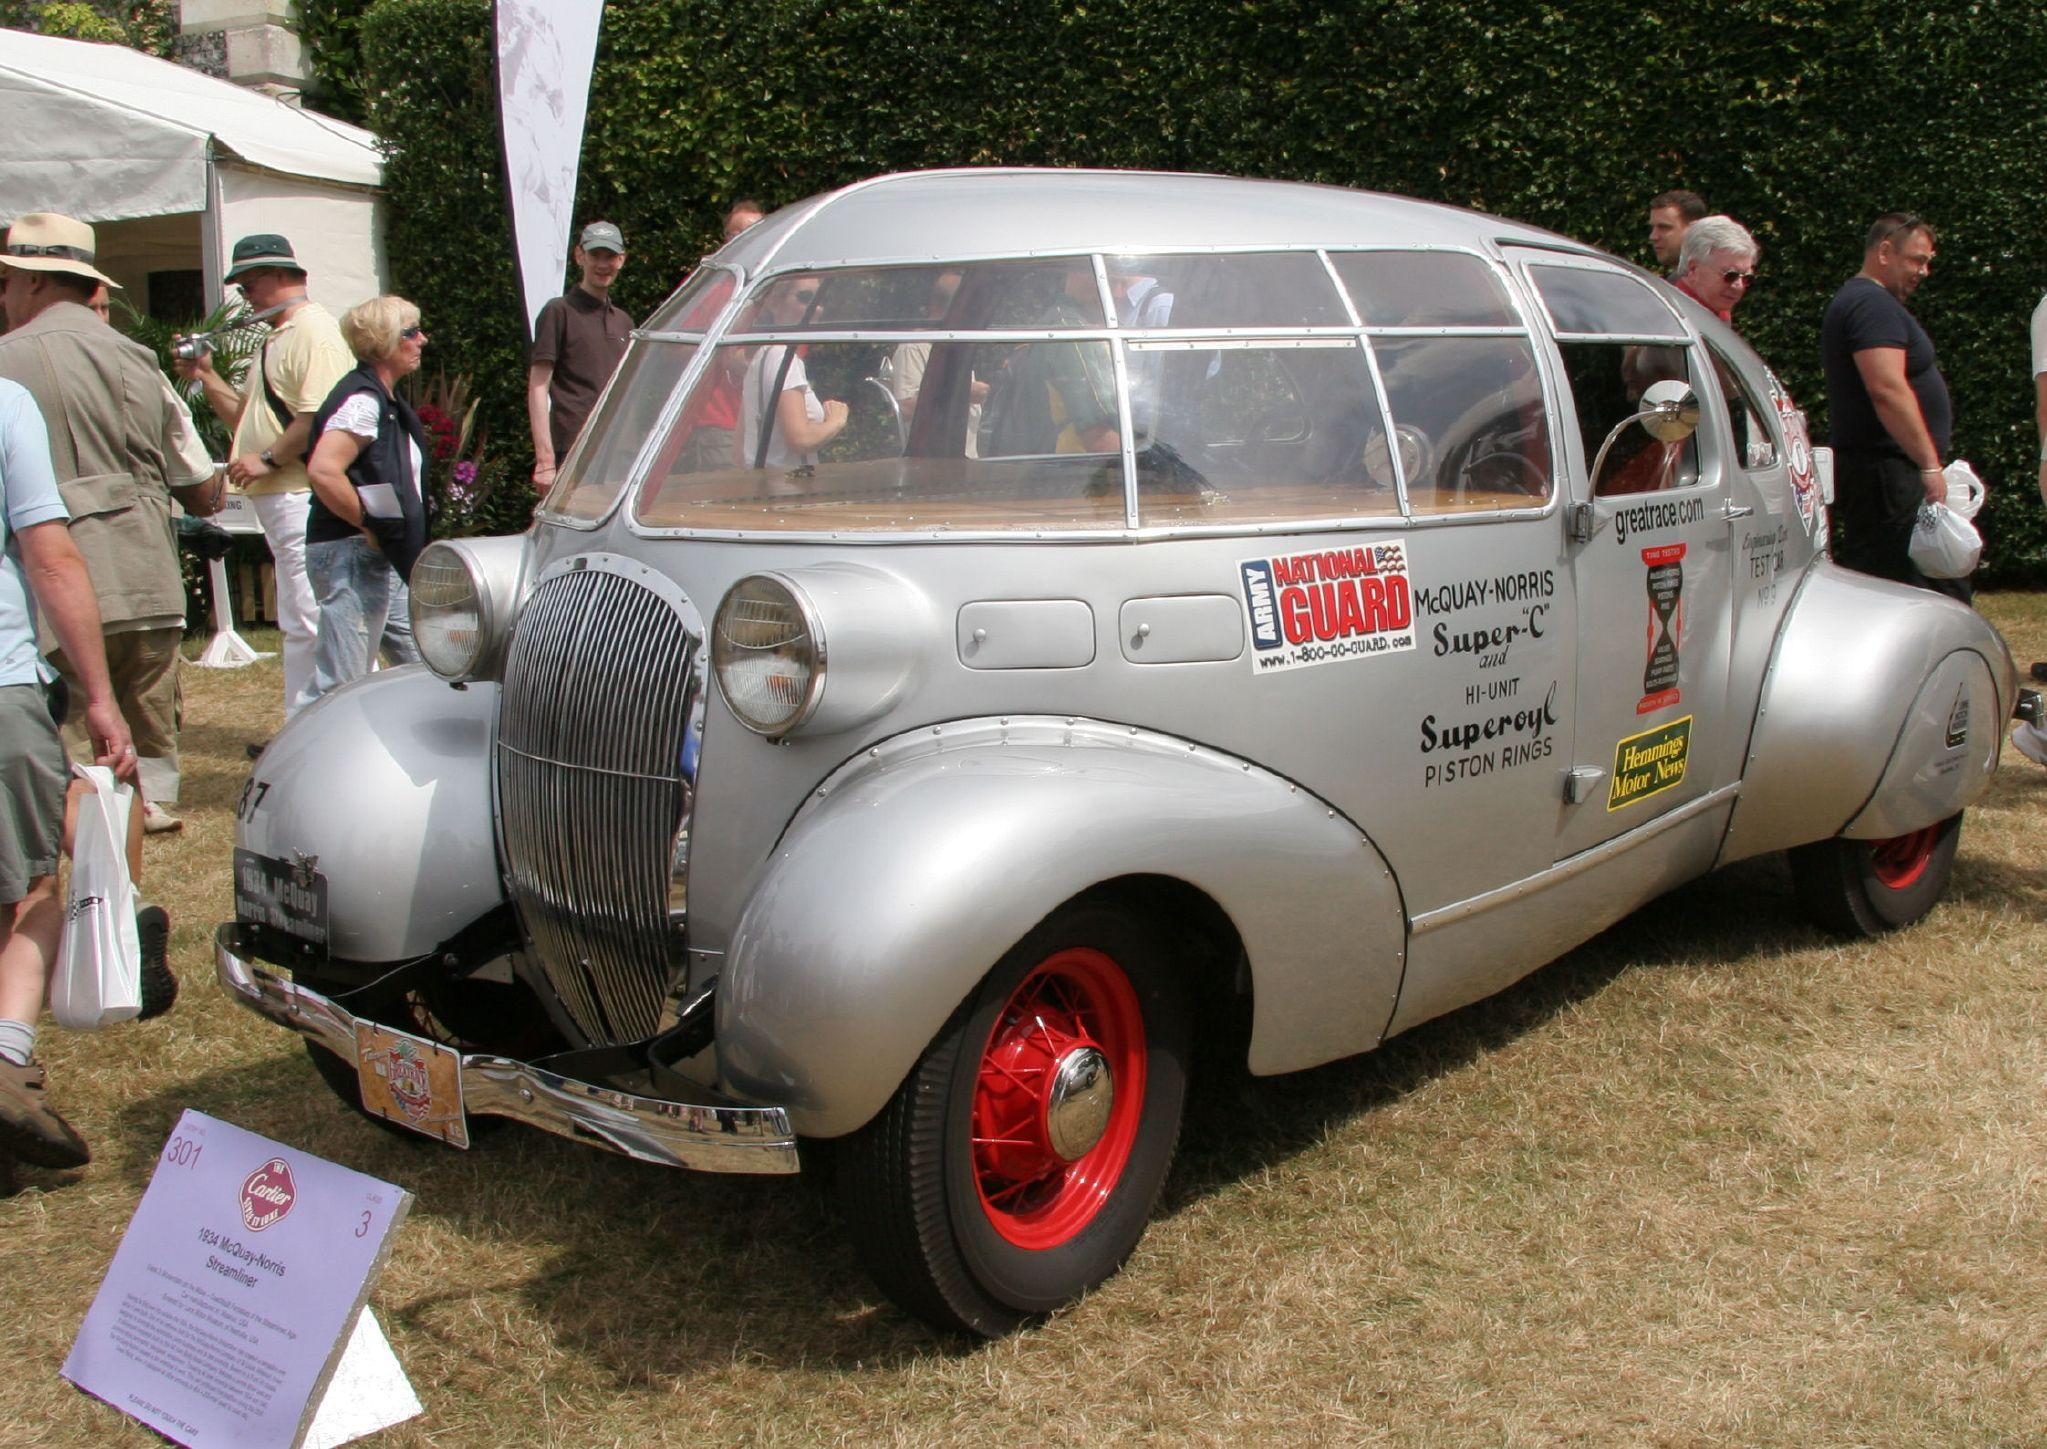 Motorized Freak of the Week: The 1934 McQuay Norris Streamliner